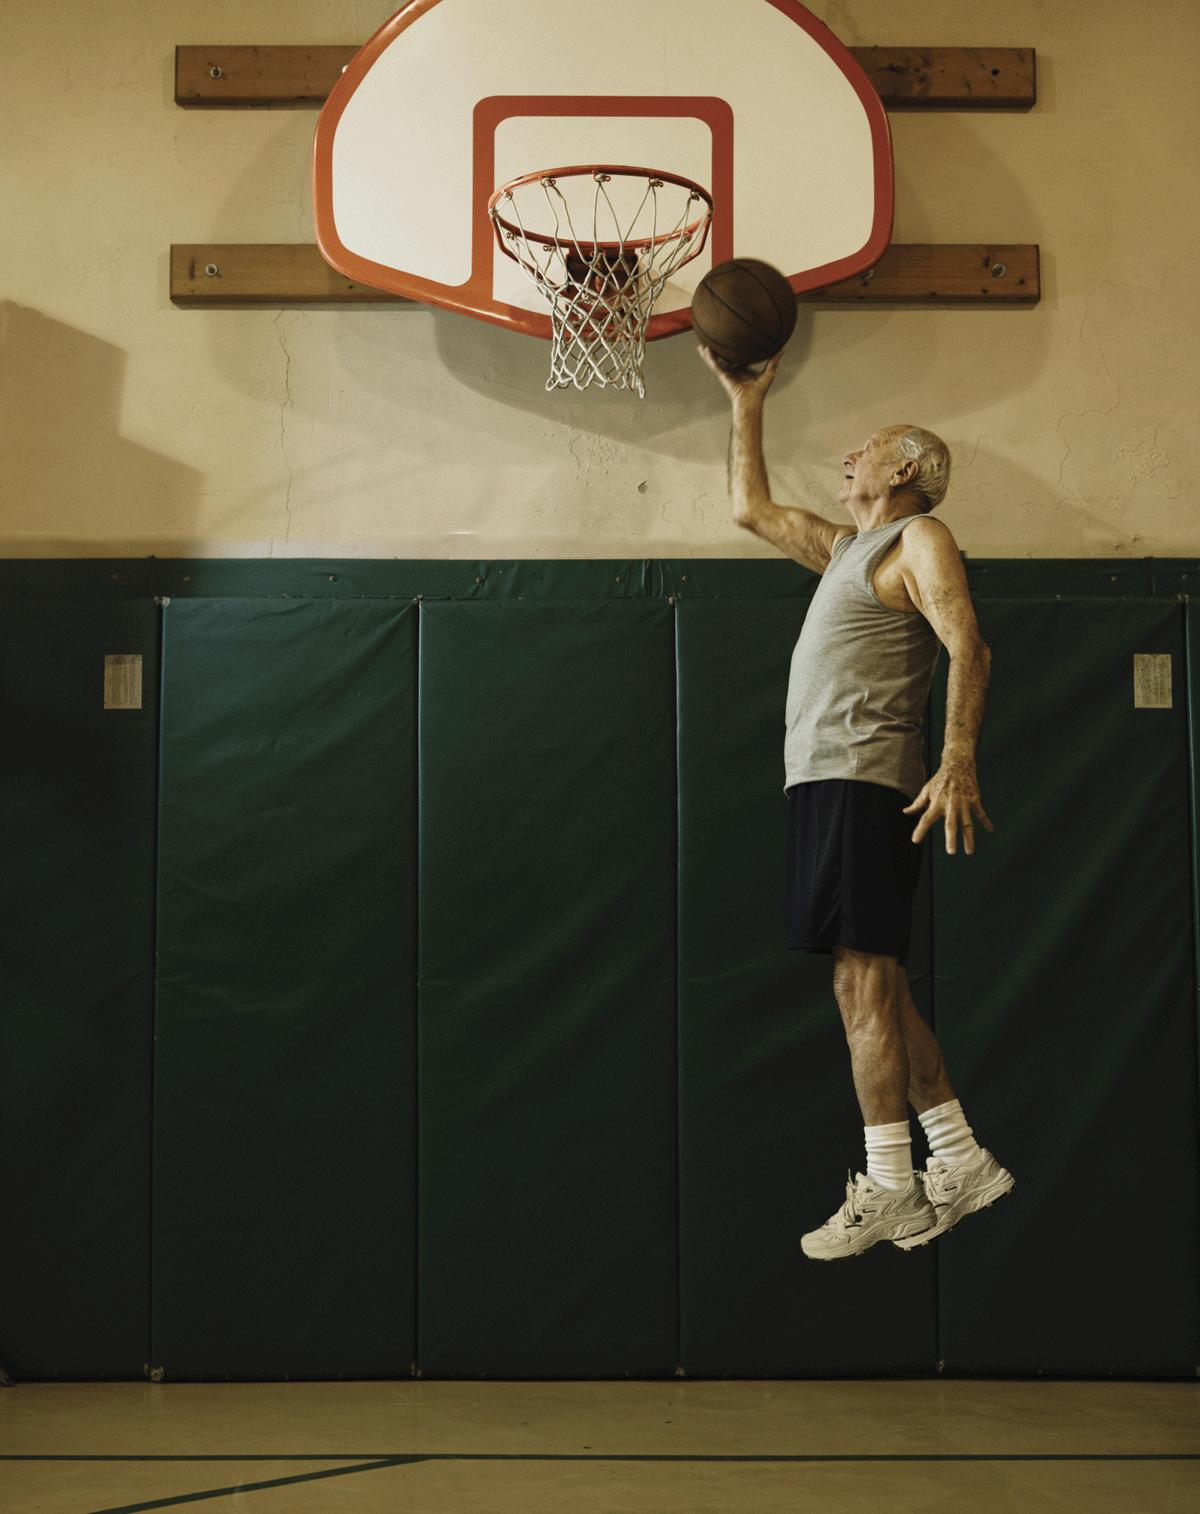 80 year old man playing basketball